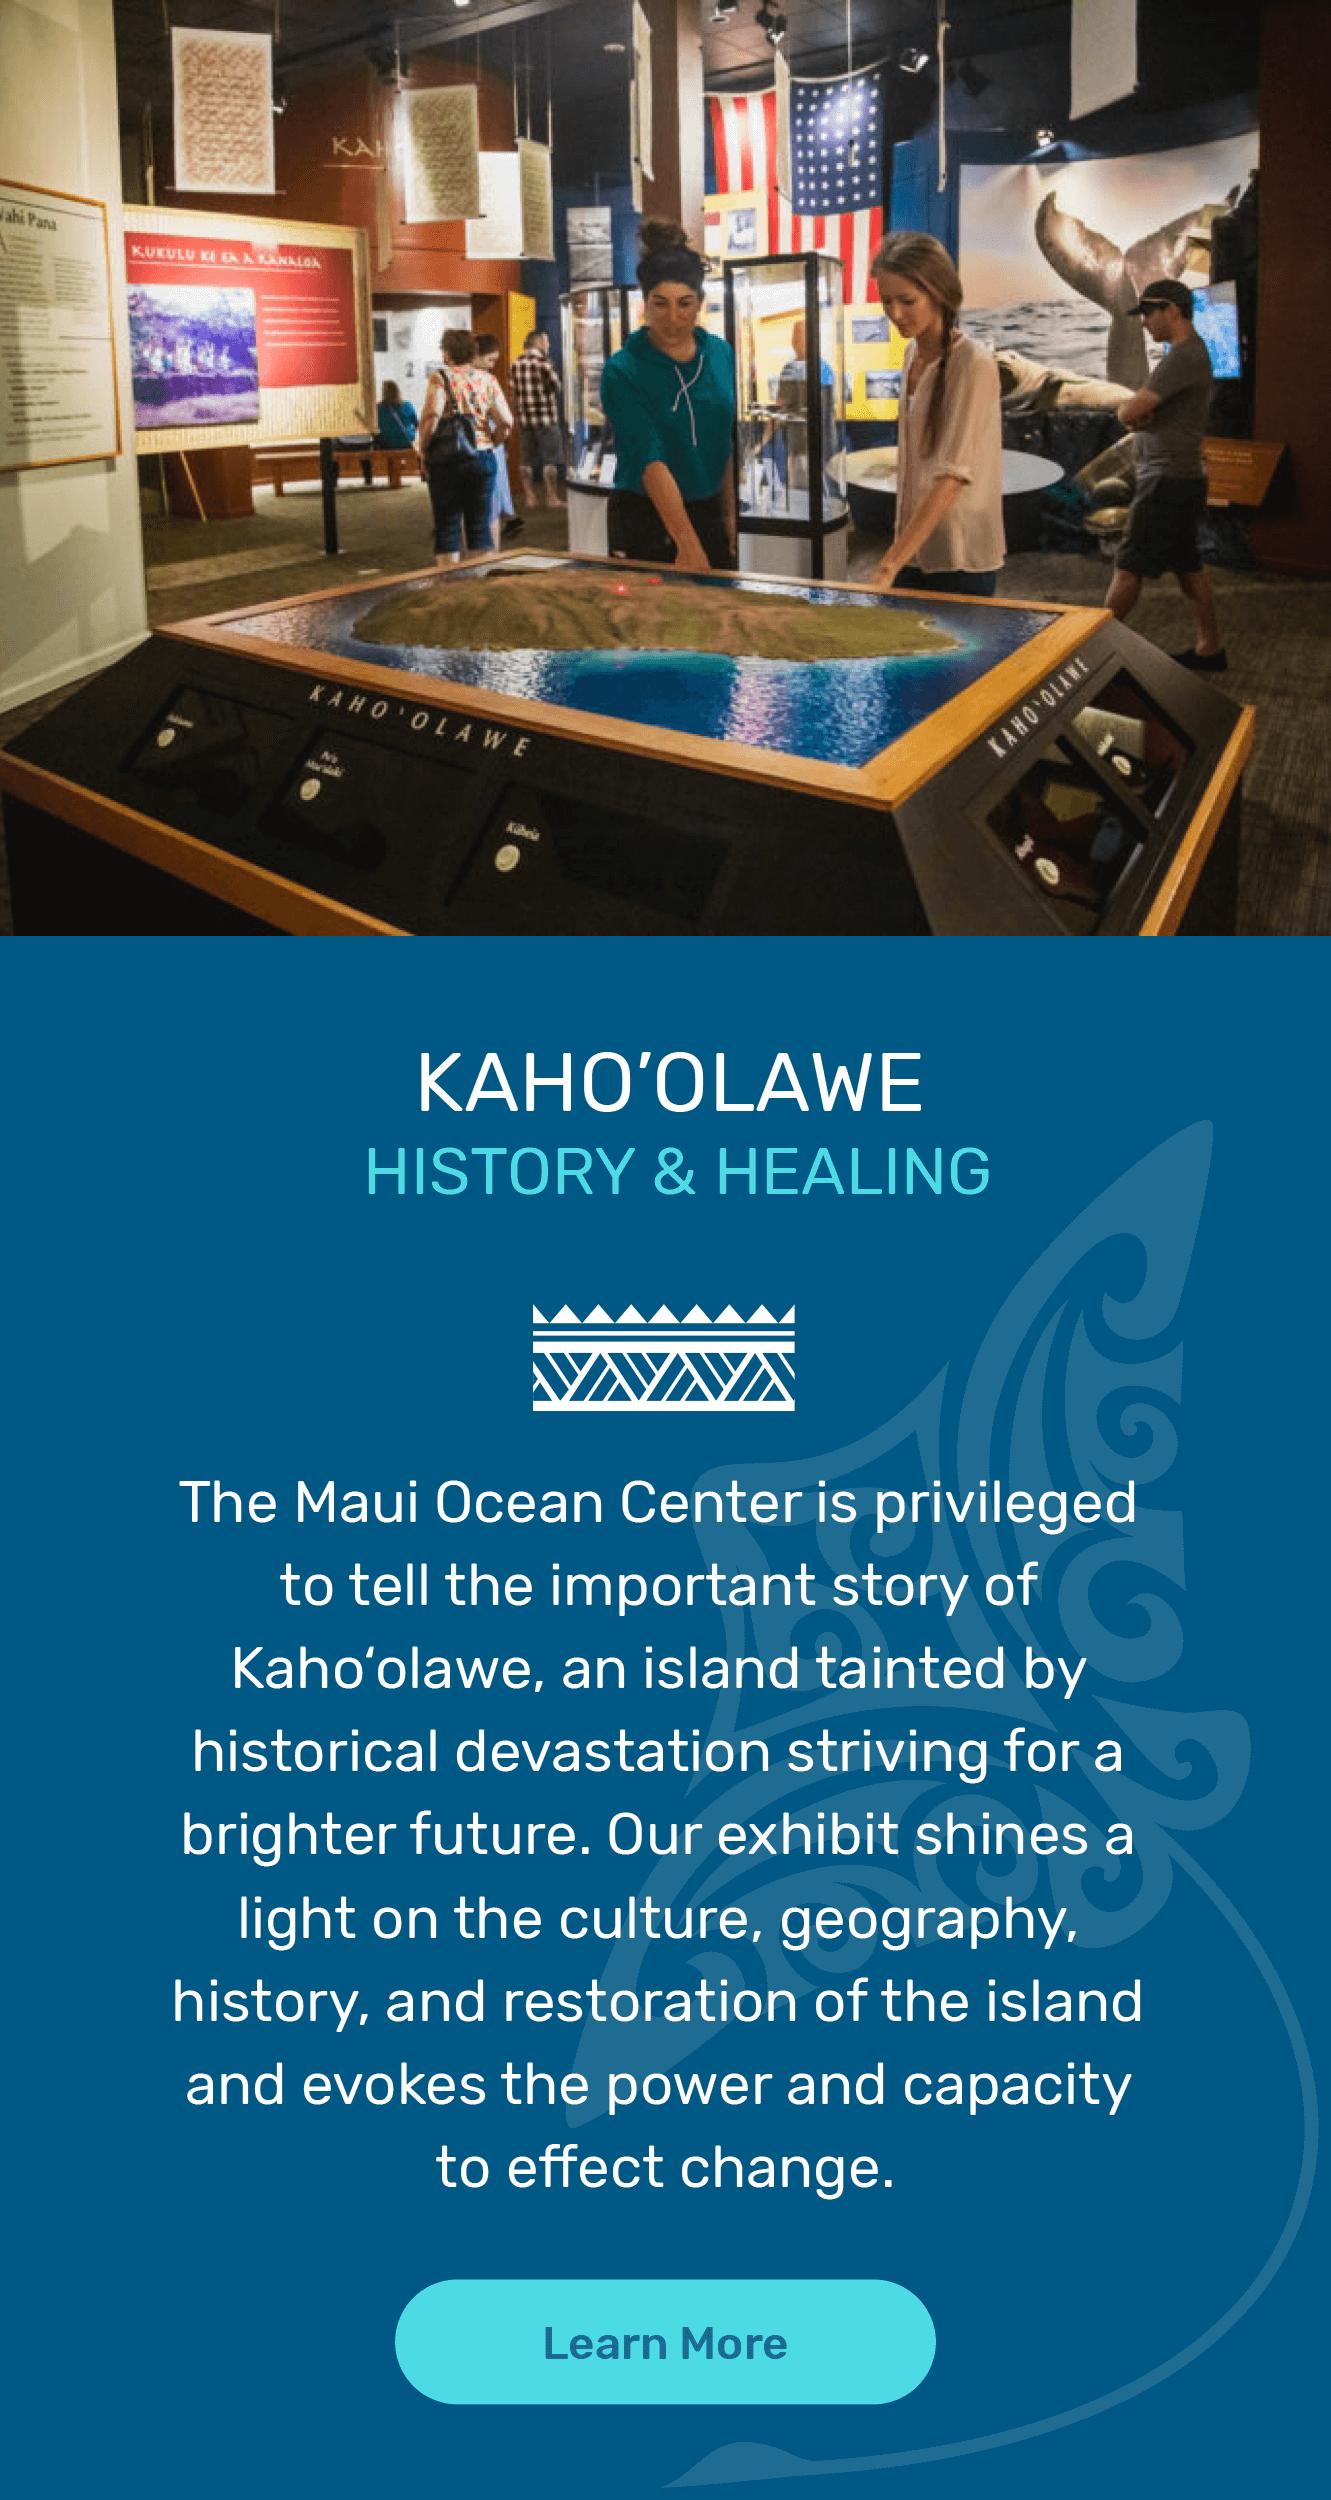 KAHO'OLAWE